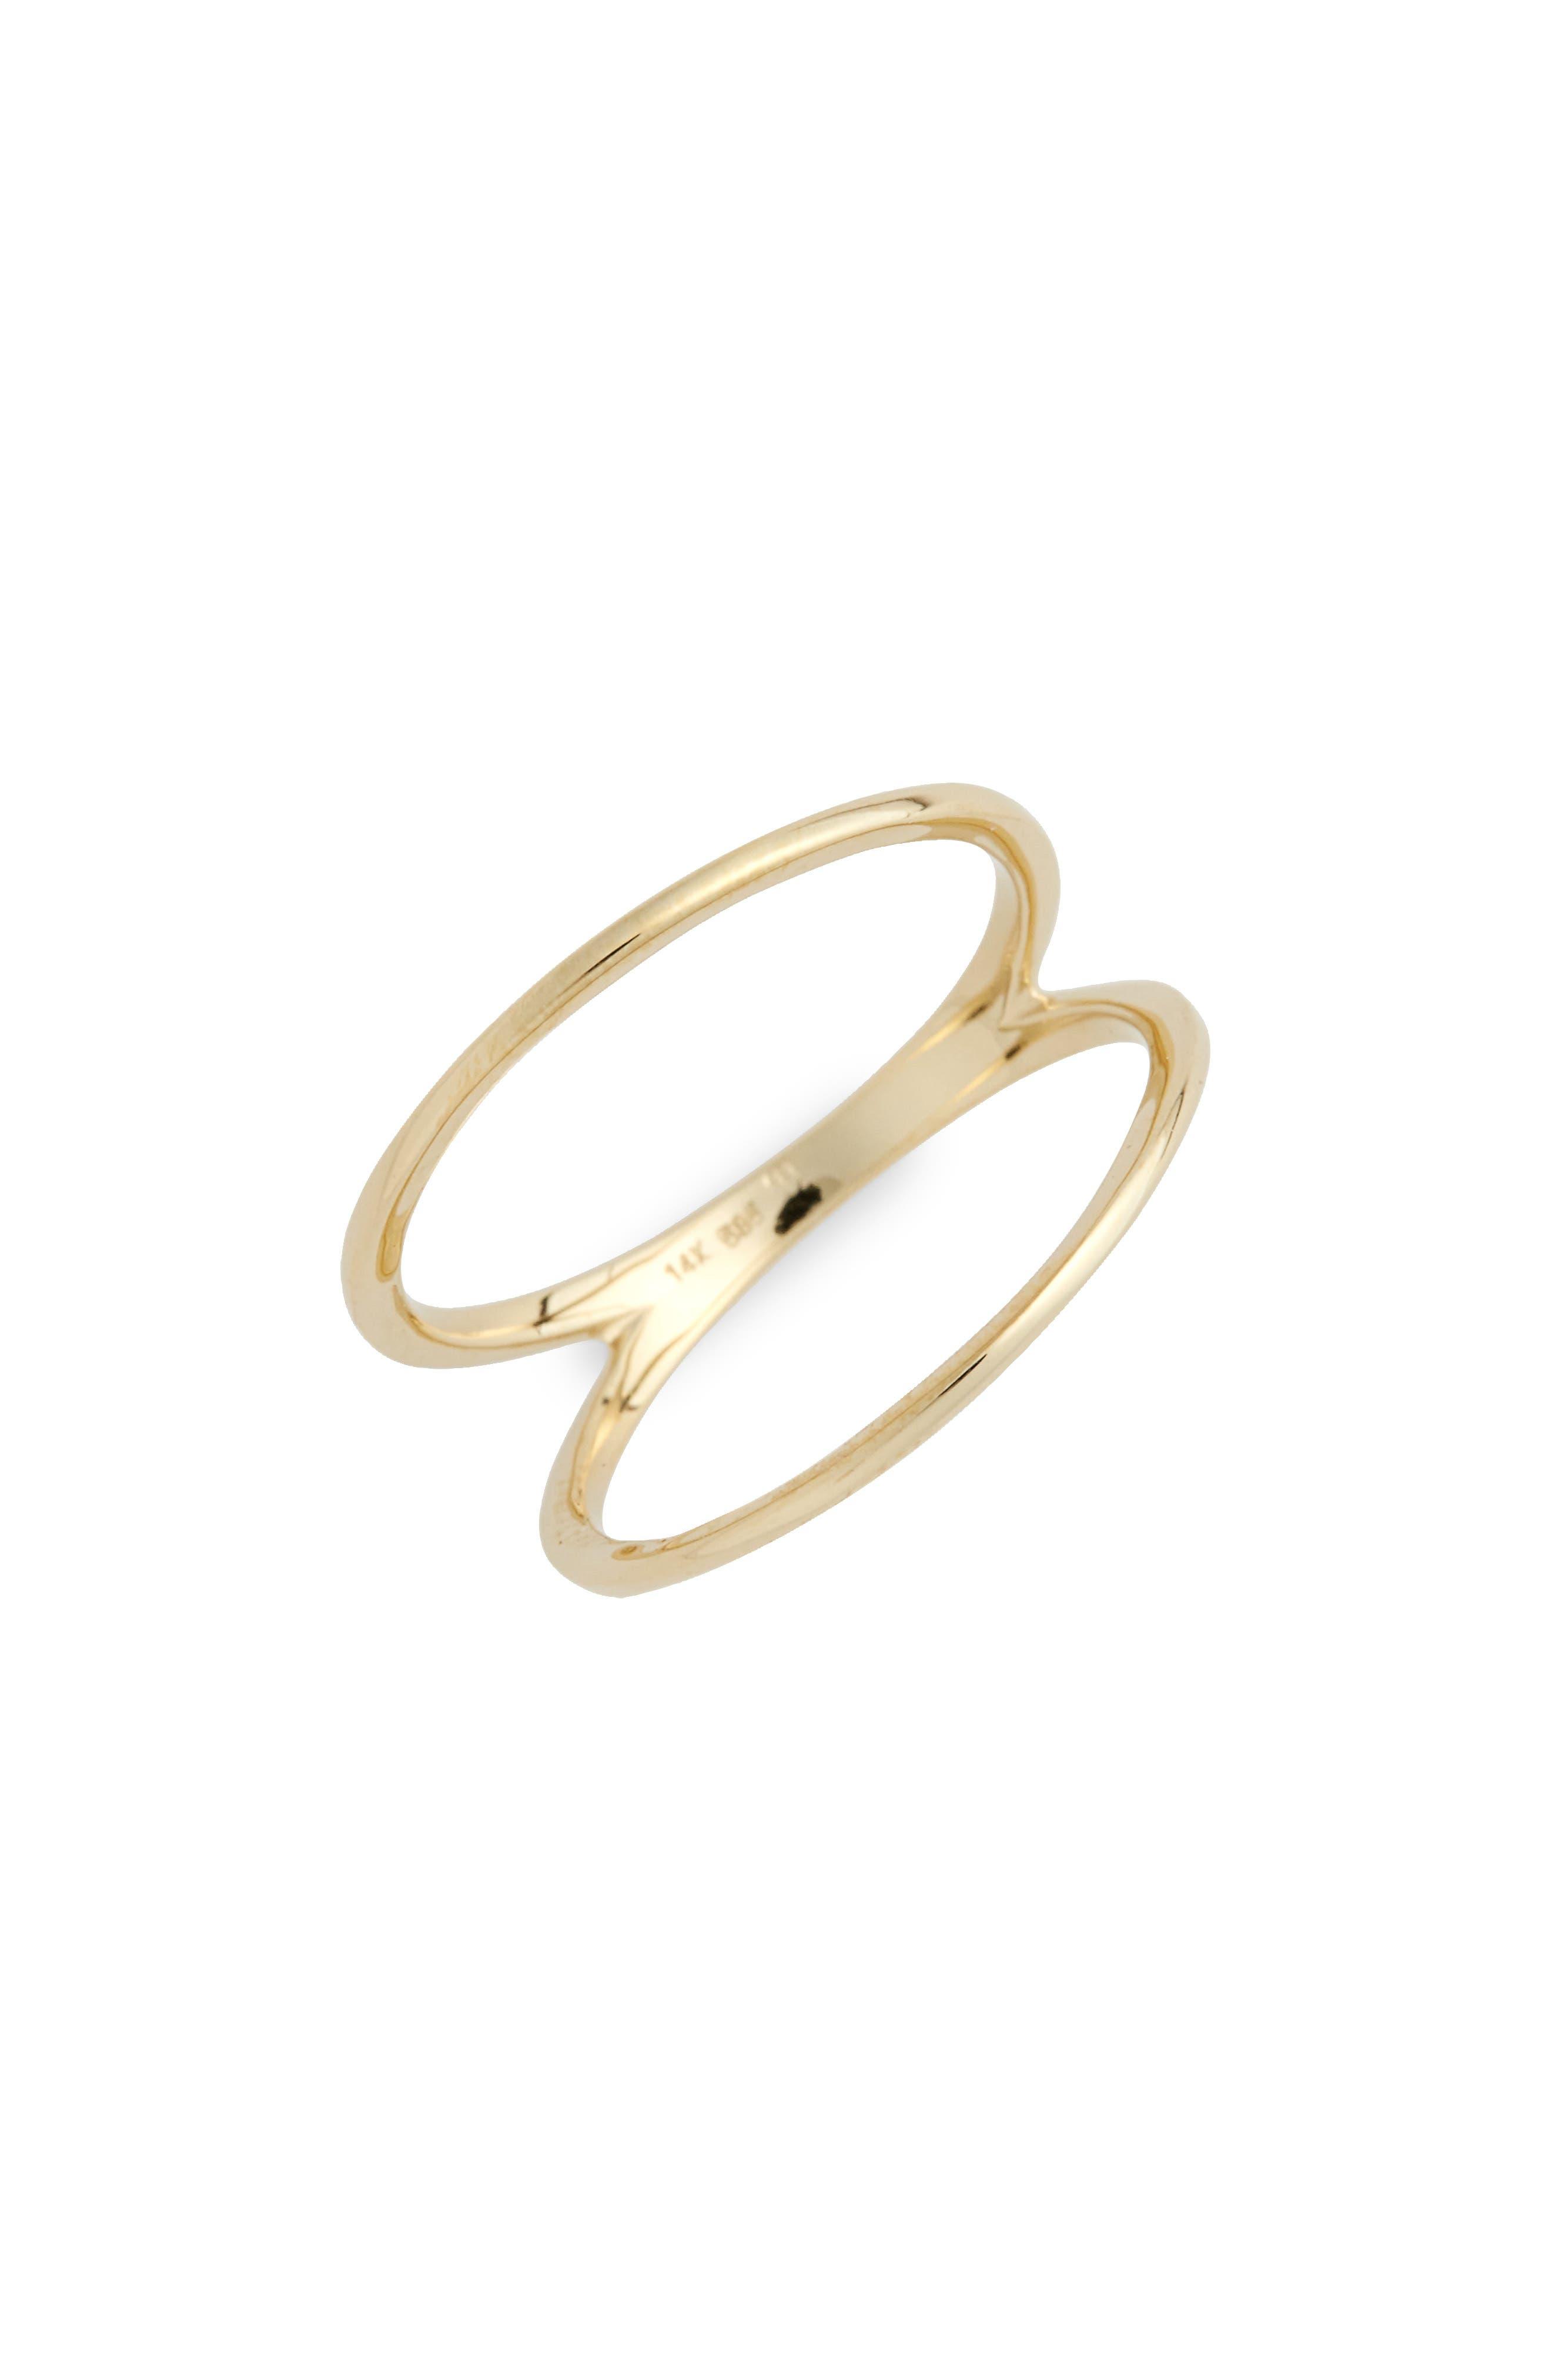 14KT Two Bar Ring,                             Main thumbnail 1, color,                             YELLOW GOLD